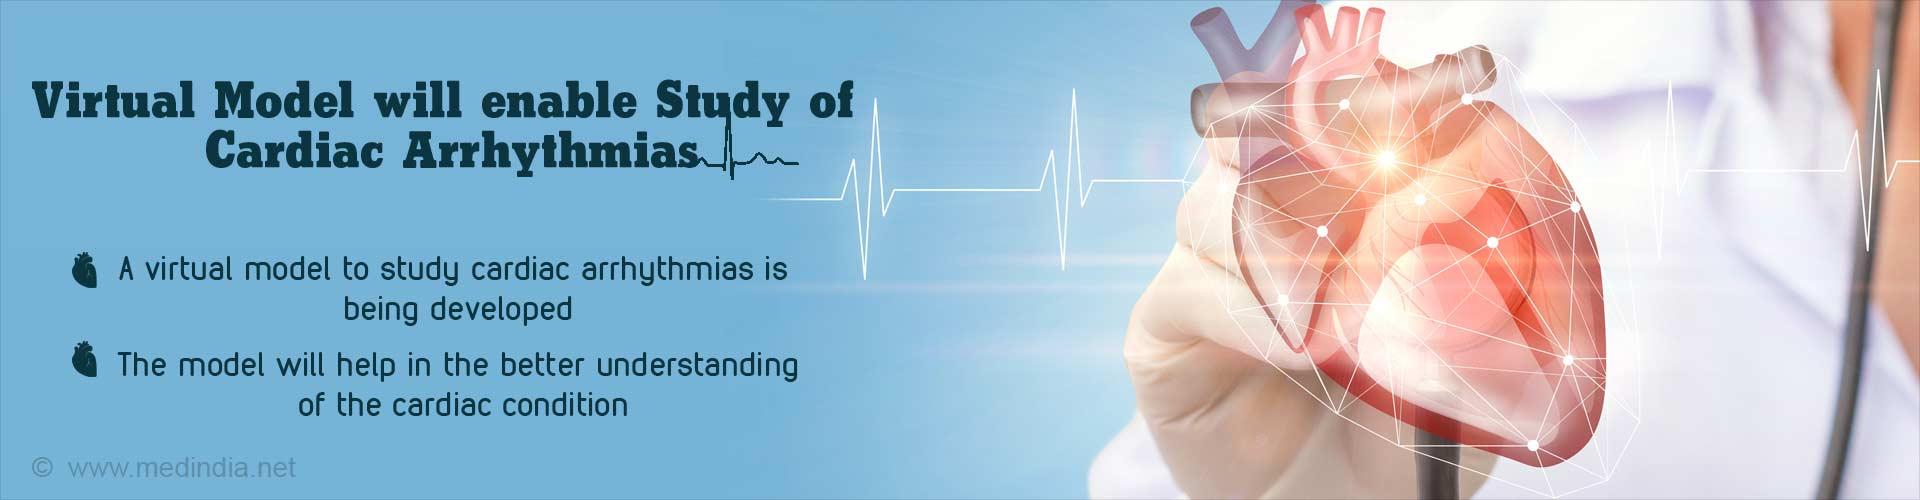 Virtual Model to Study Cardiac Arrhythmias Being Developed